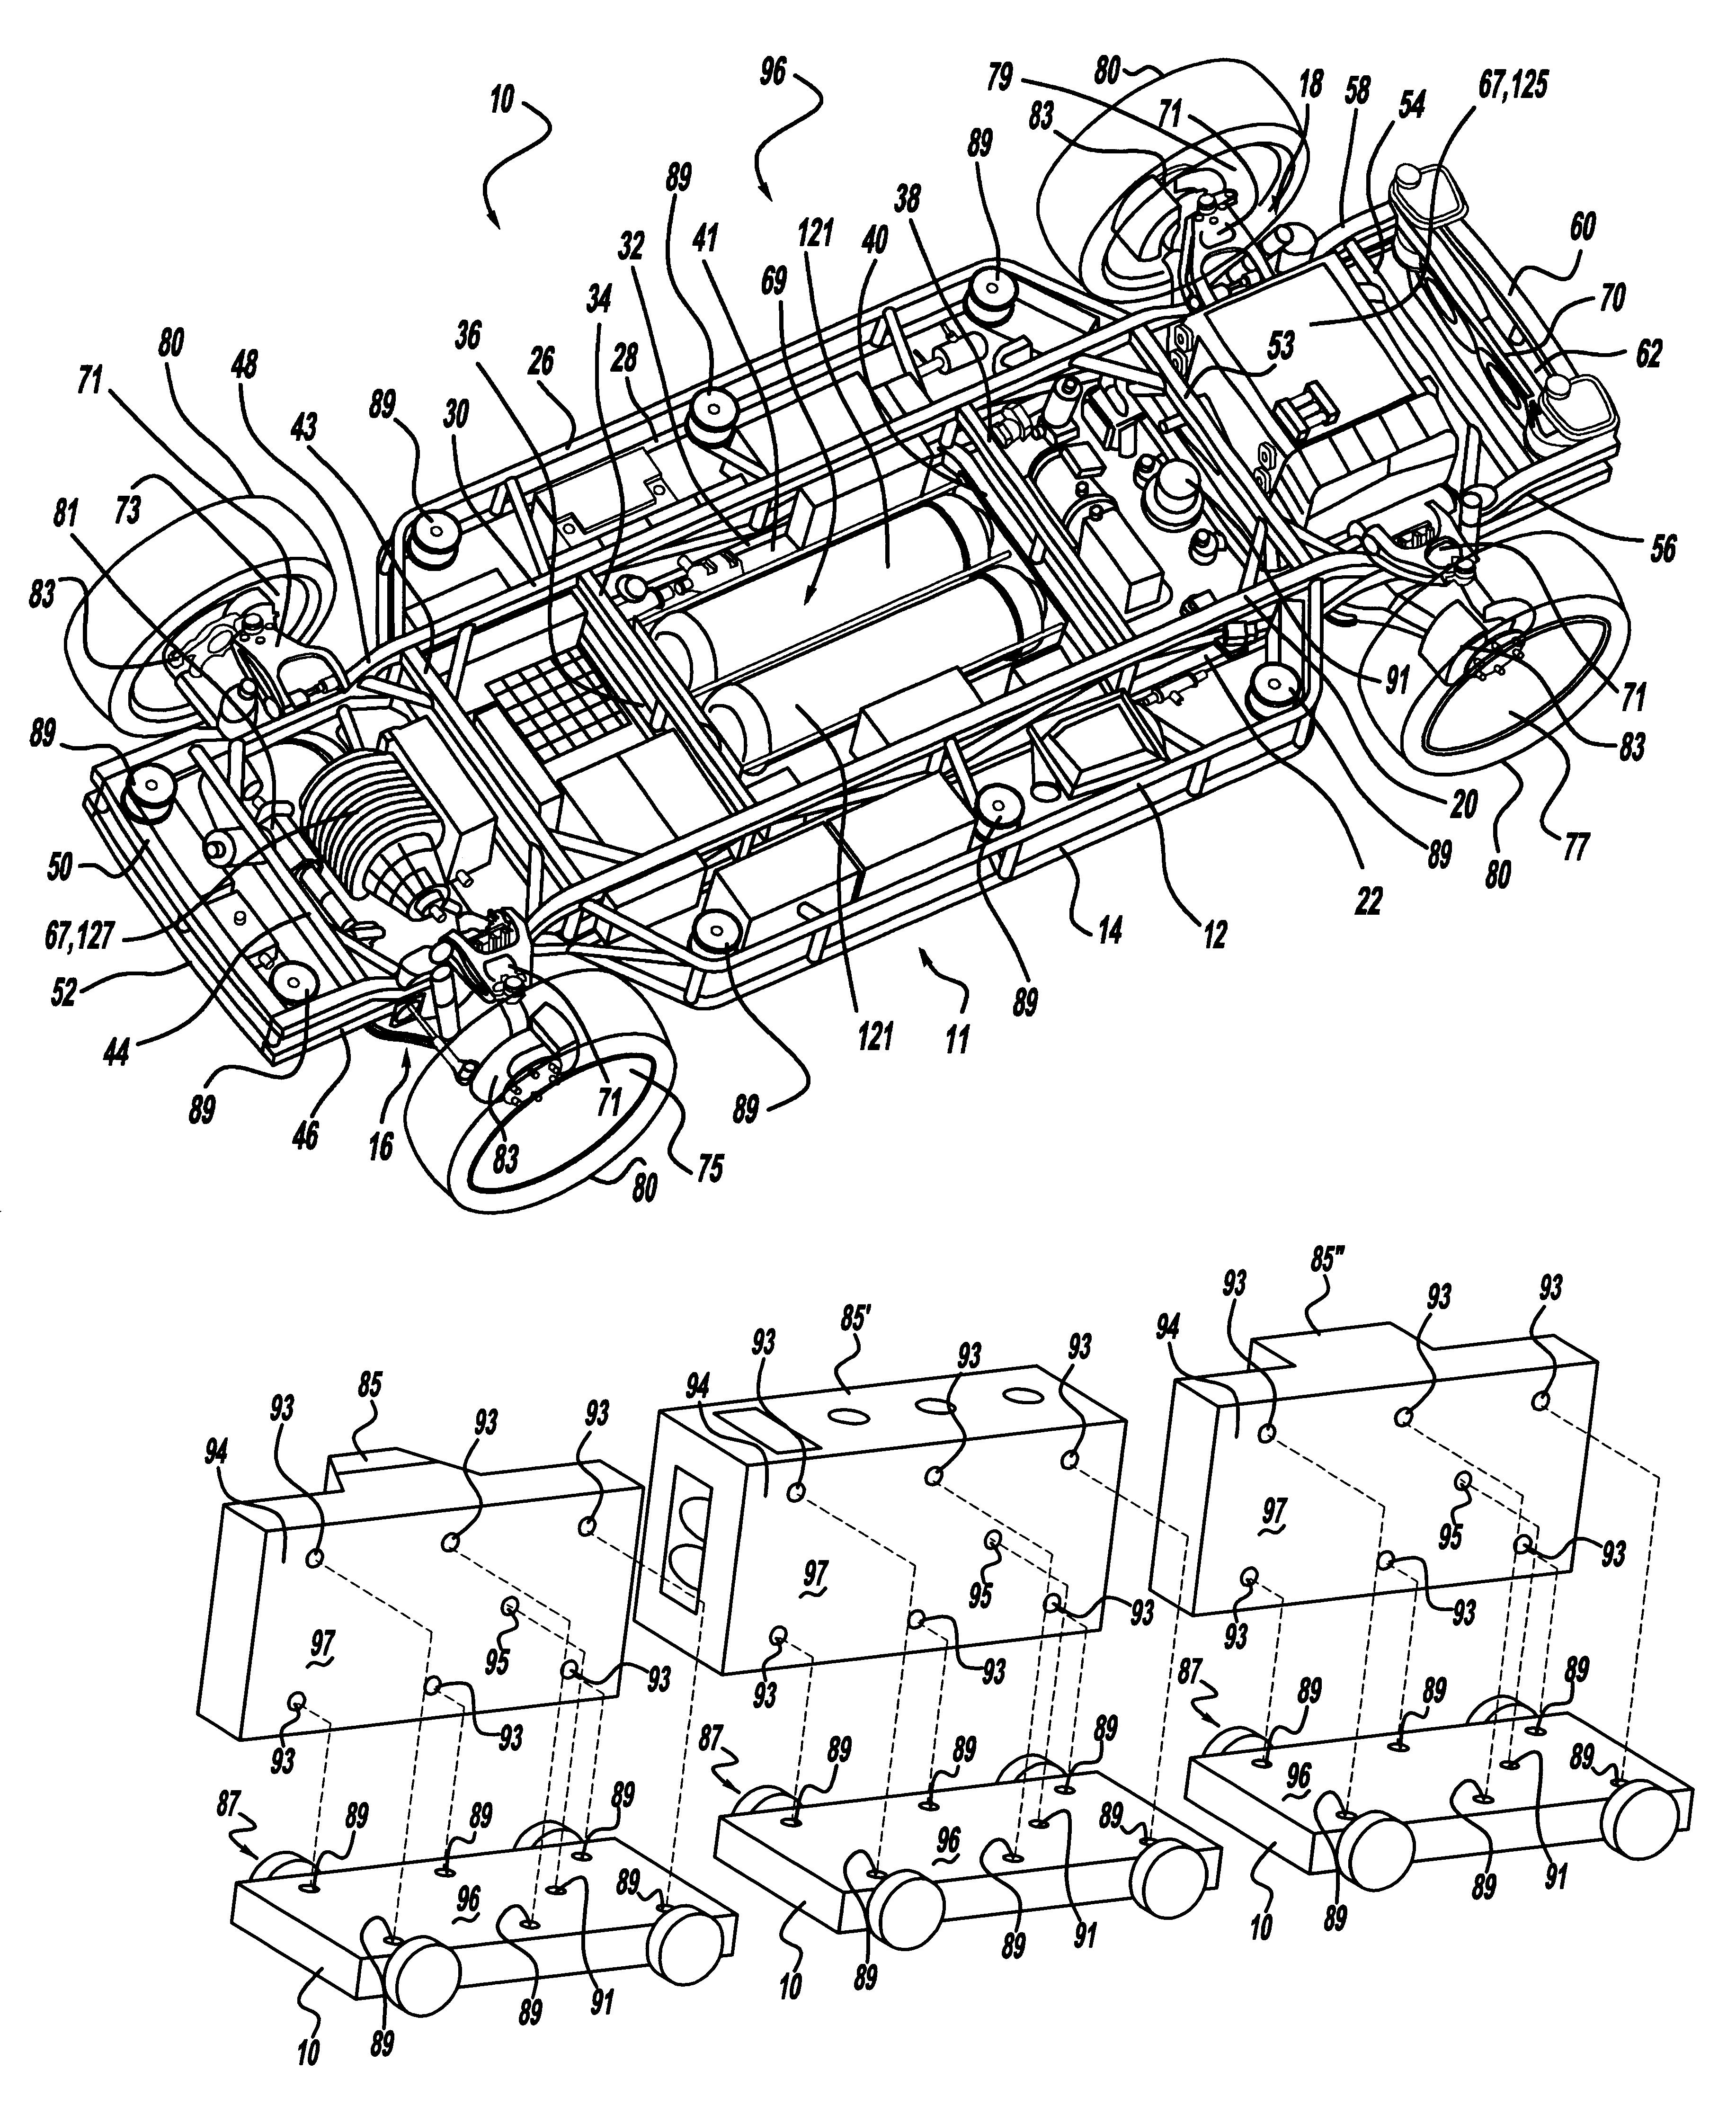 1984 Corvette Wiring Diagram Chis 1985 Corvette Fuse Box